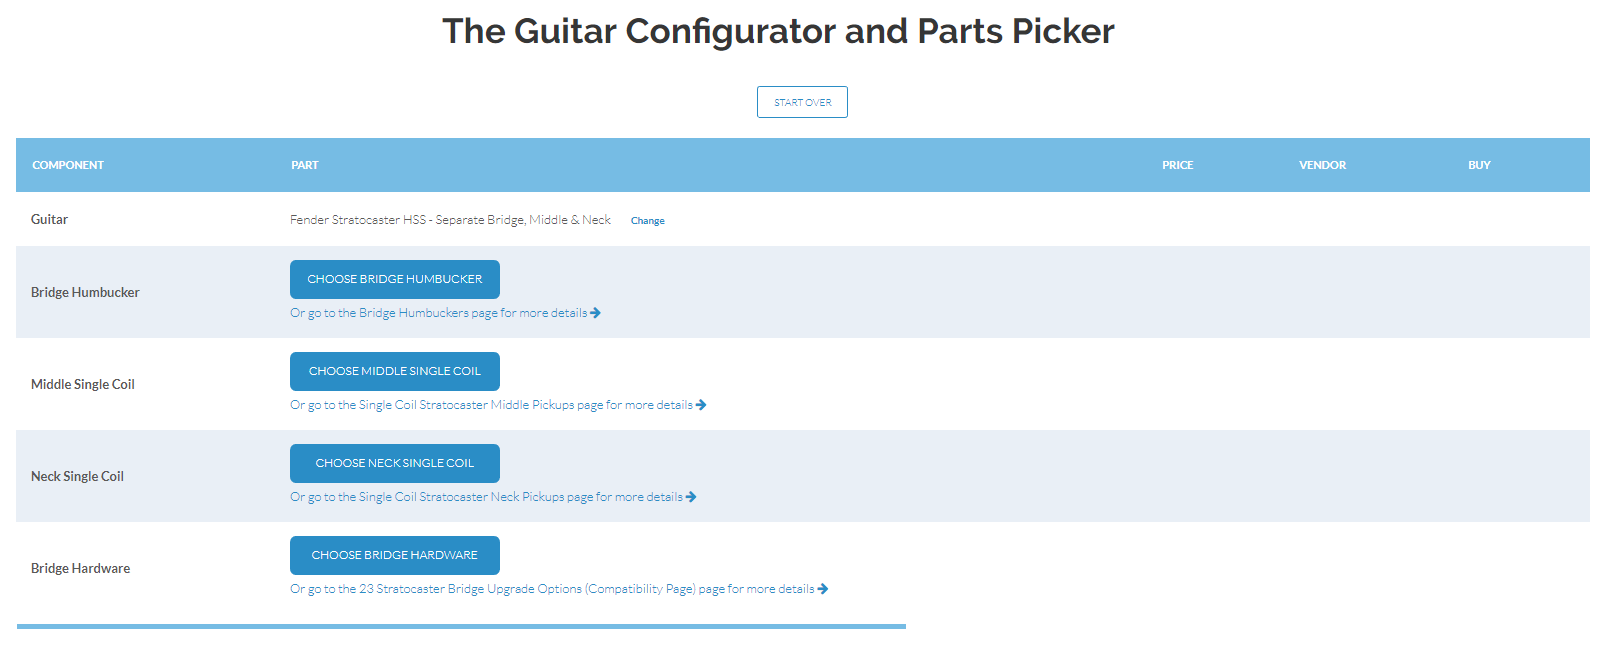 The Guitar Configurator